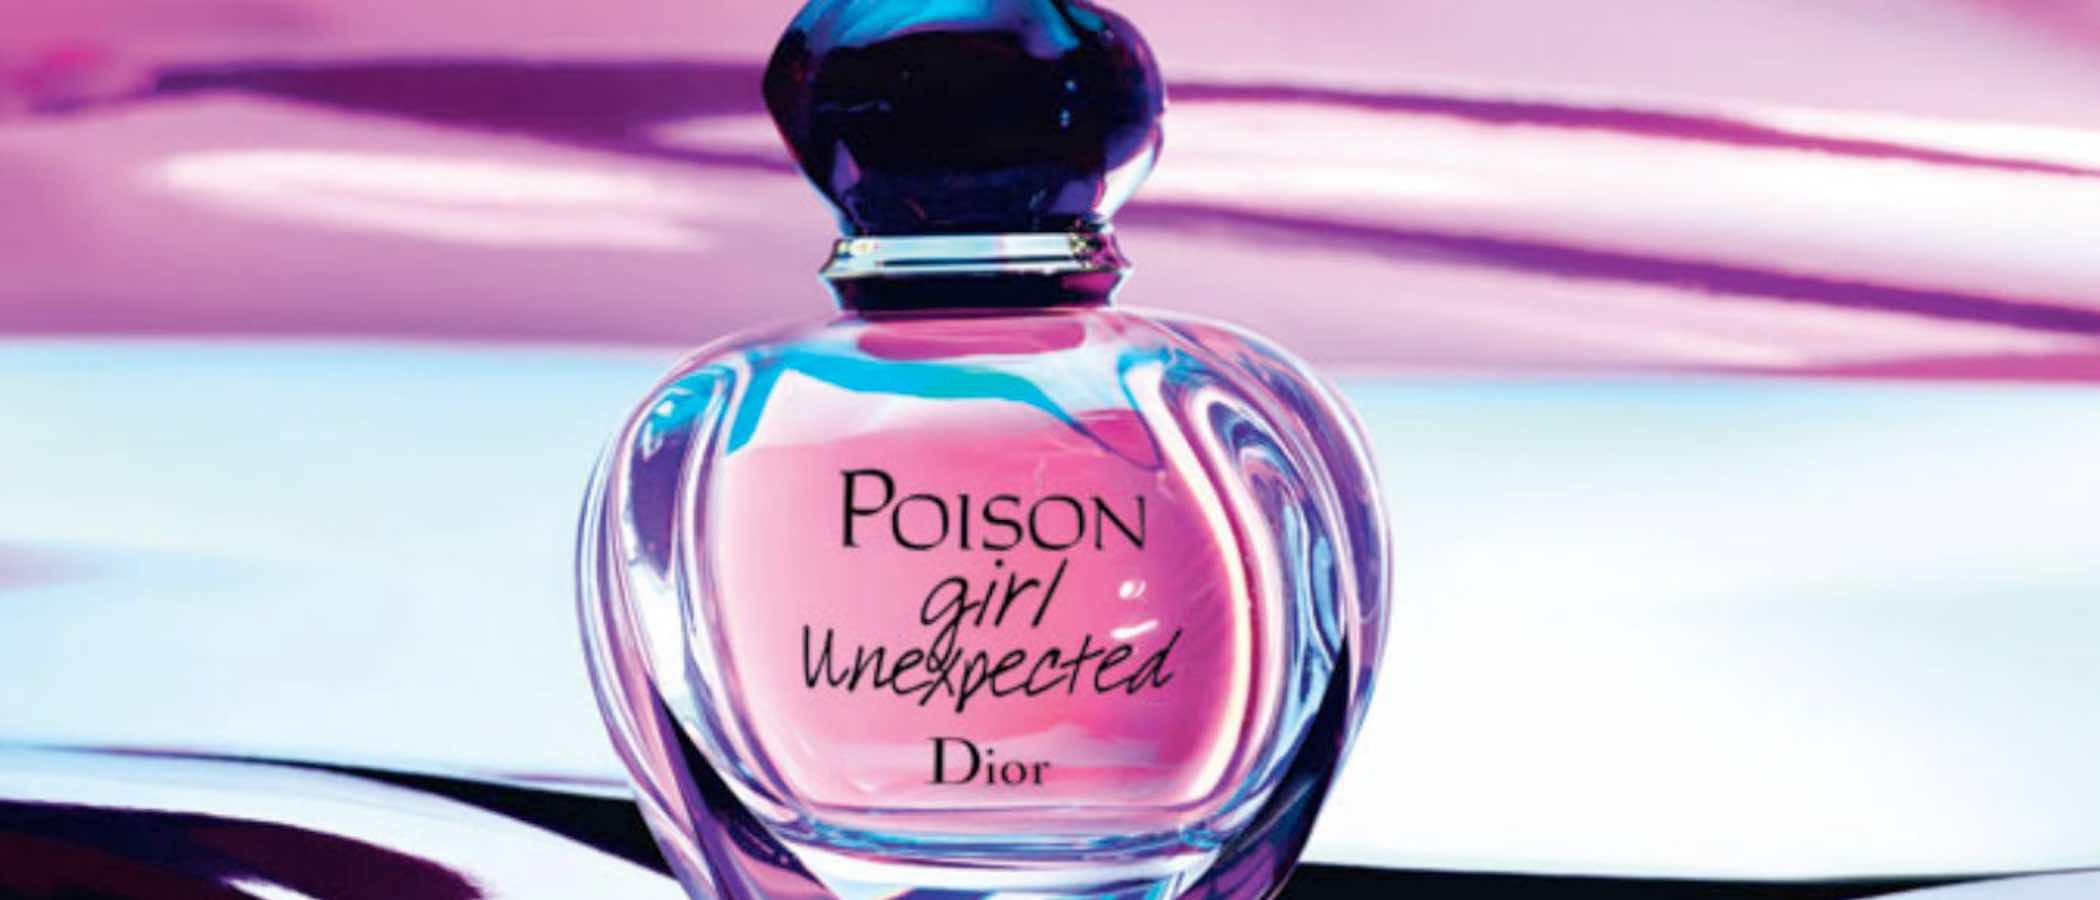 Dior lanza una reedición de 'Poison Girl' más fresca y chispeante: 'Poison Girl Unexpected'